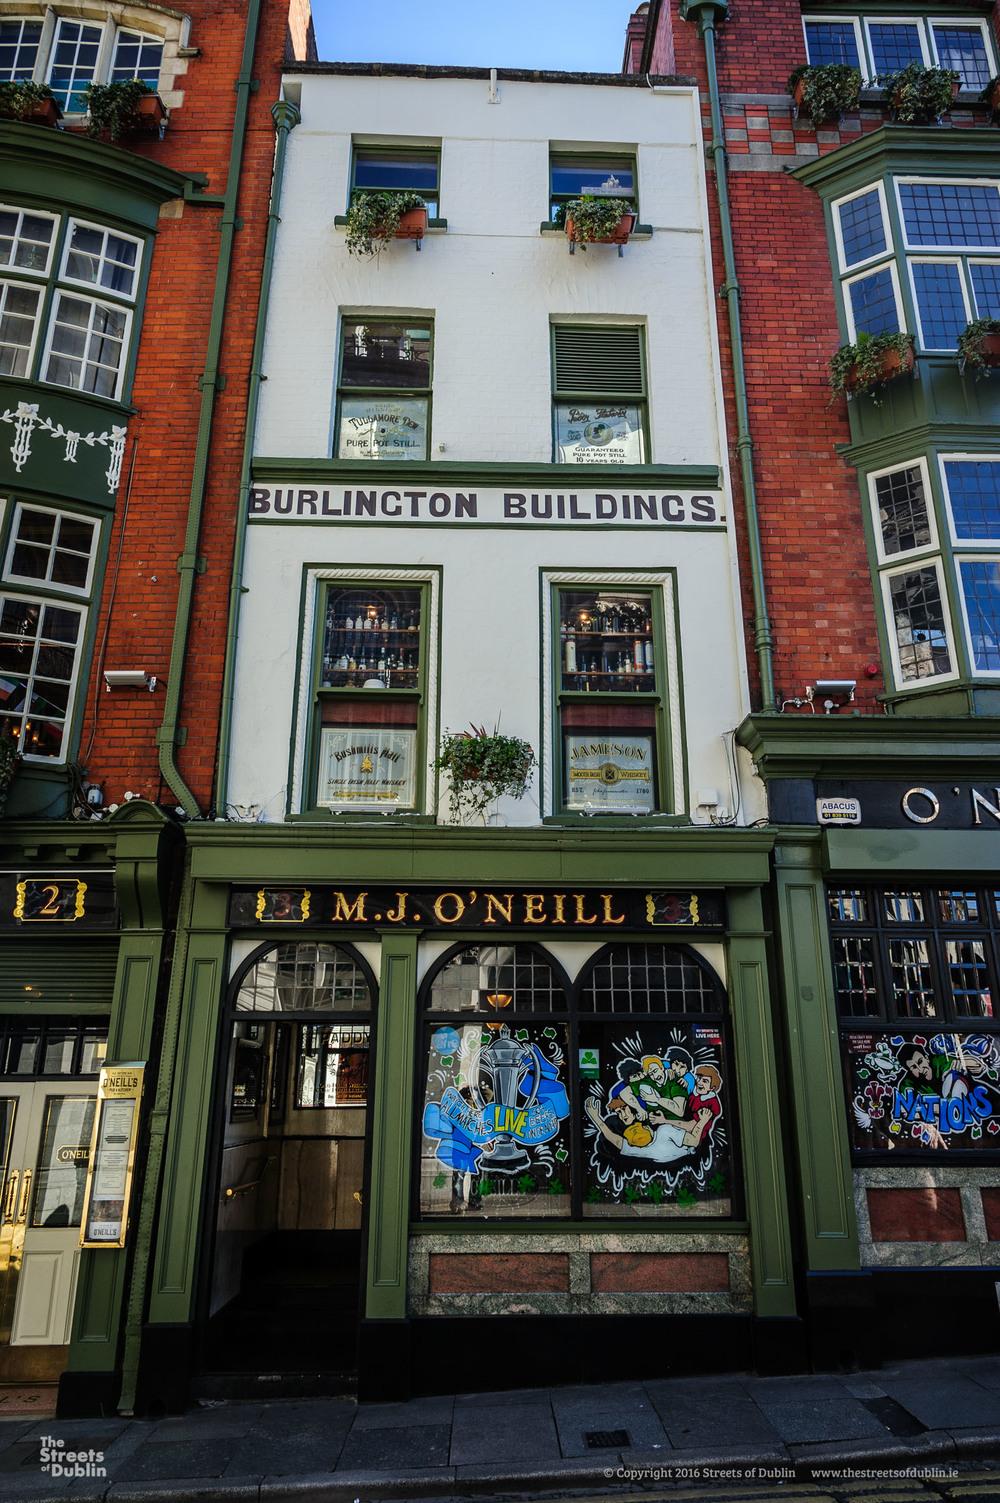 Streets-of-Dublin-Photo-1399.jpg